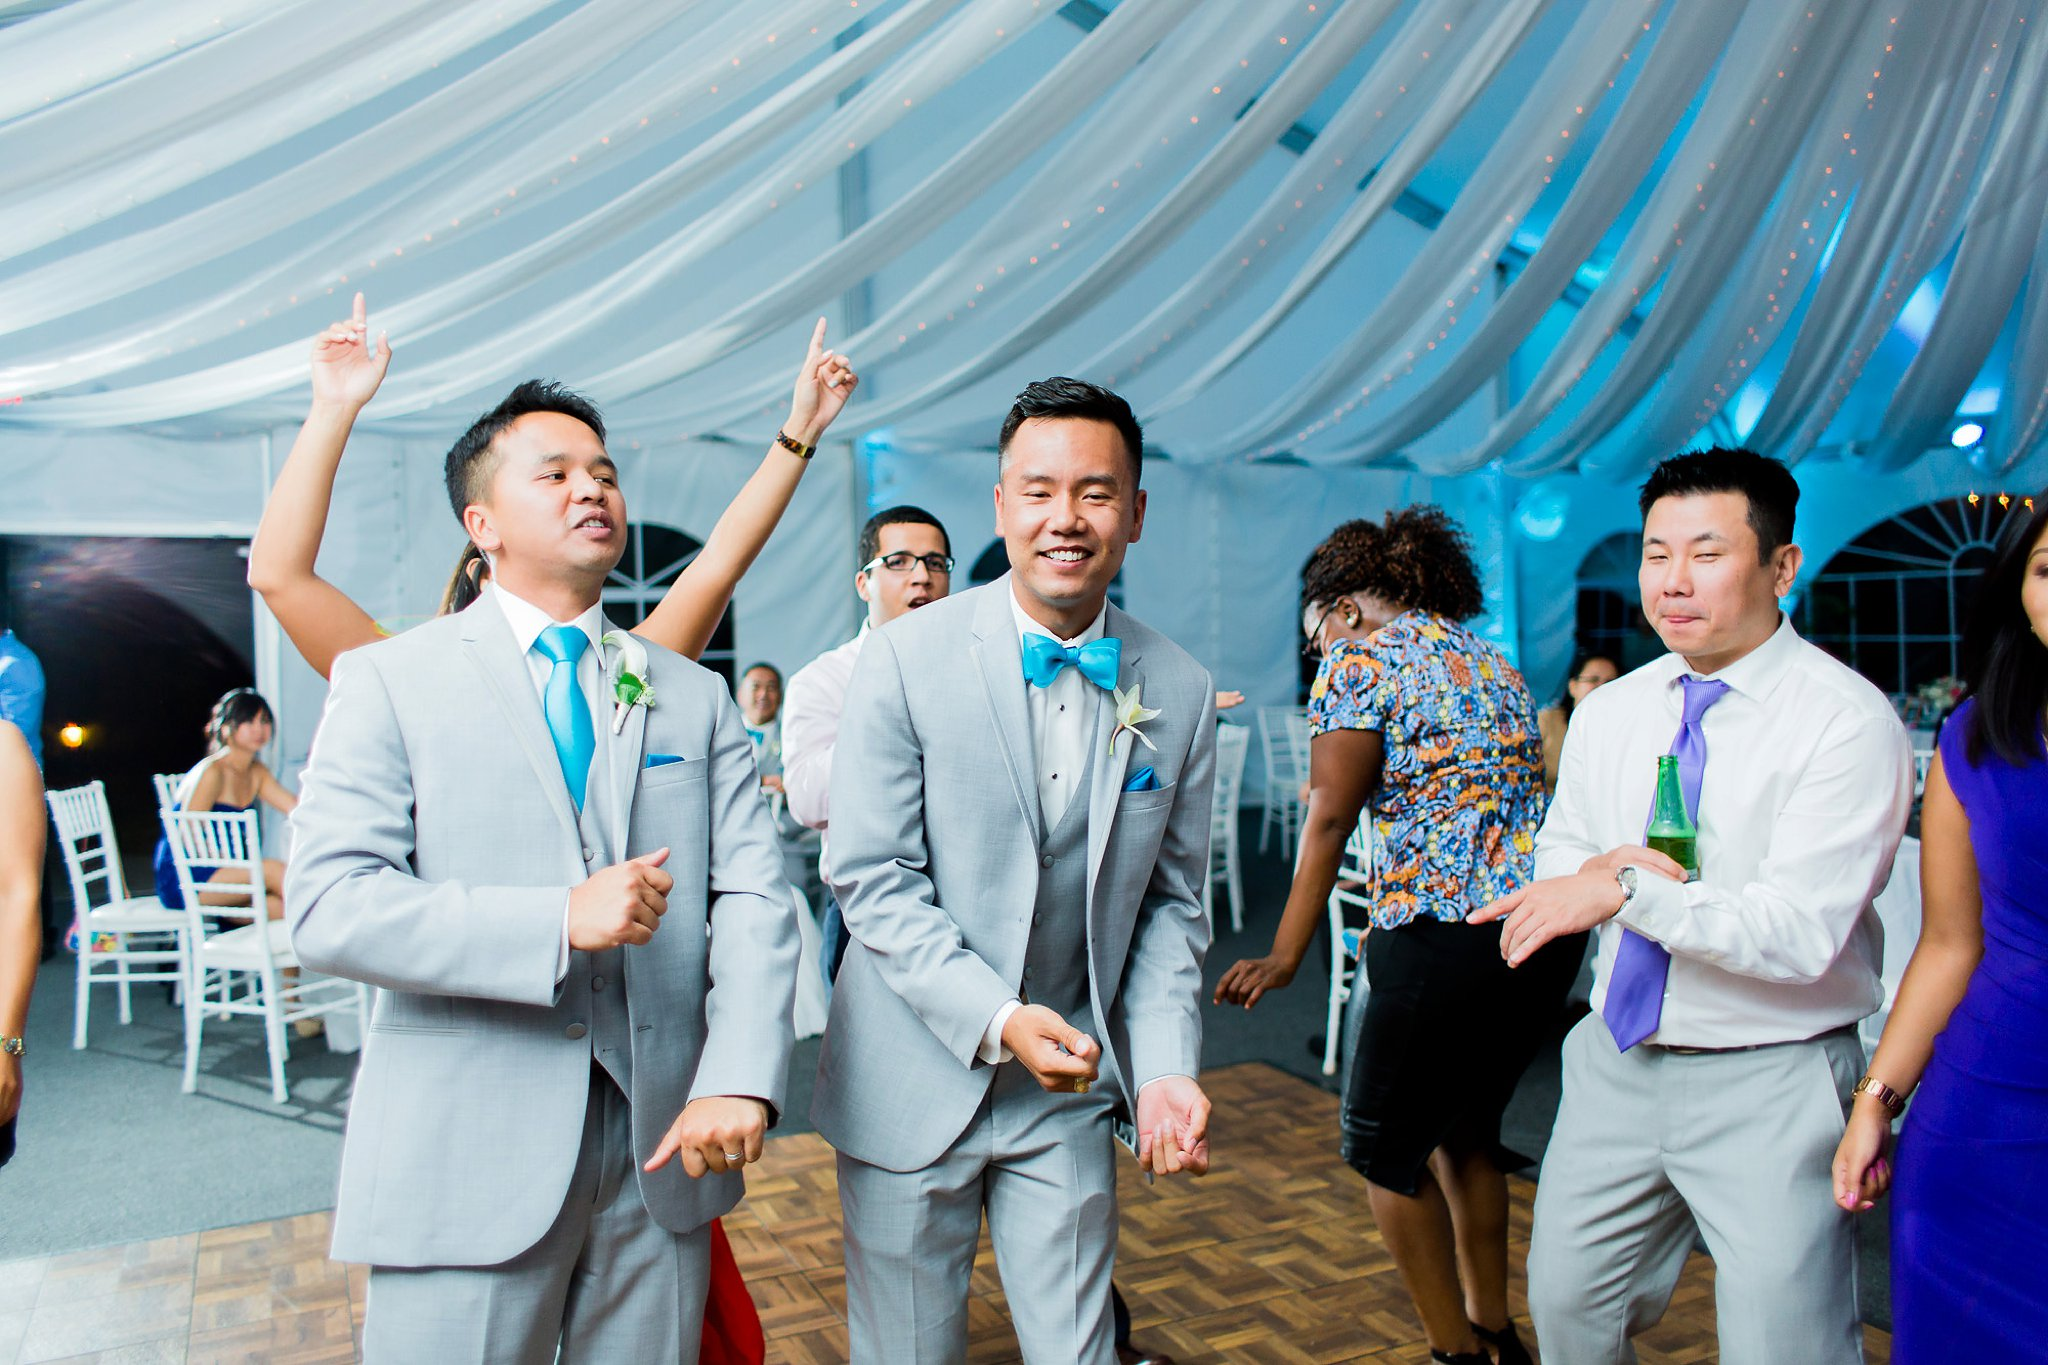 Herrington On The Bay Wedding Photos Maryland Wedding Photographer Megan Kelsey Photography Thin & Phil-138.jpg